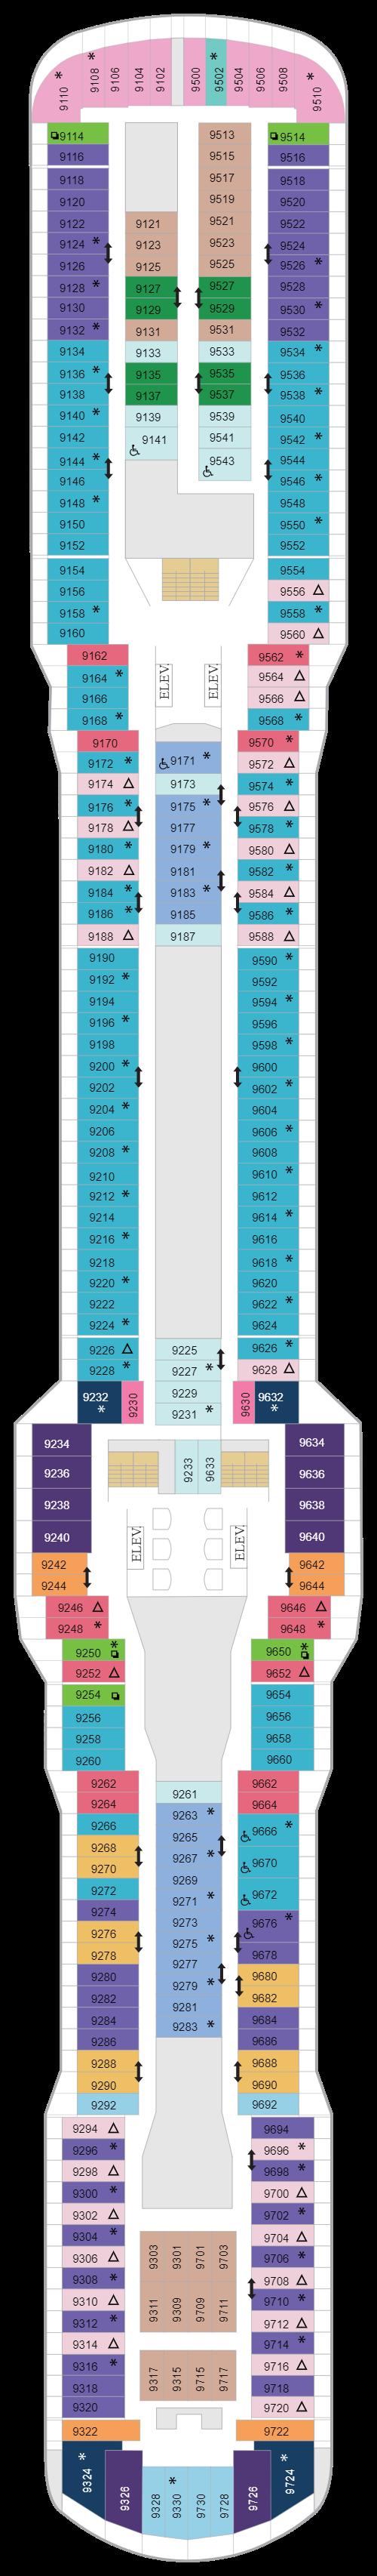 Deck 9 (January 24th, 2021 - Jan12th, 2022)